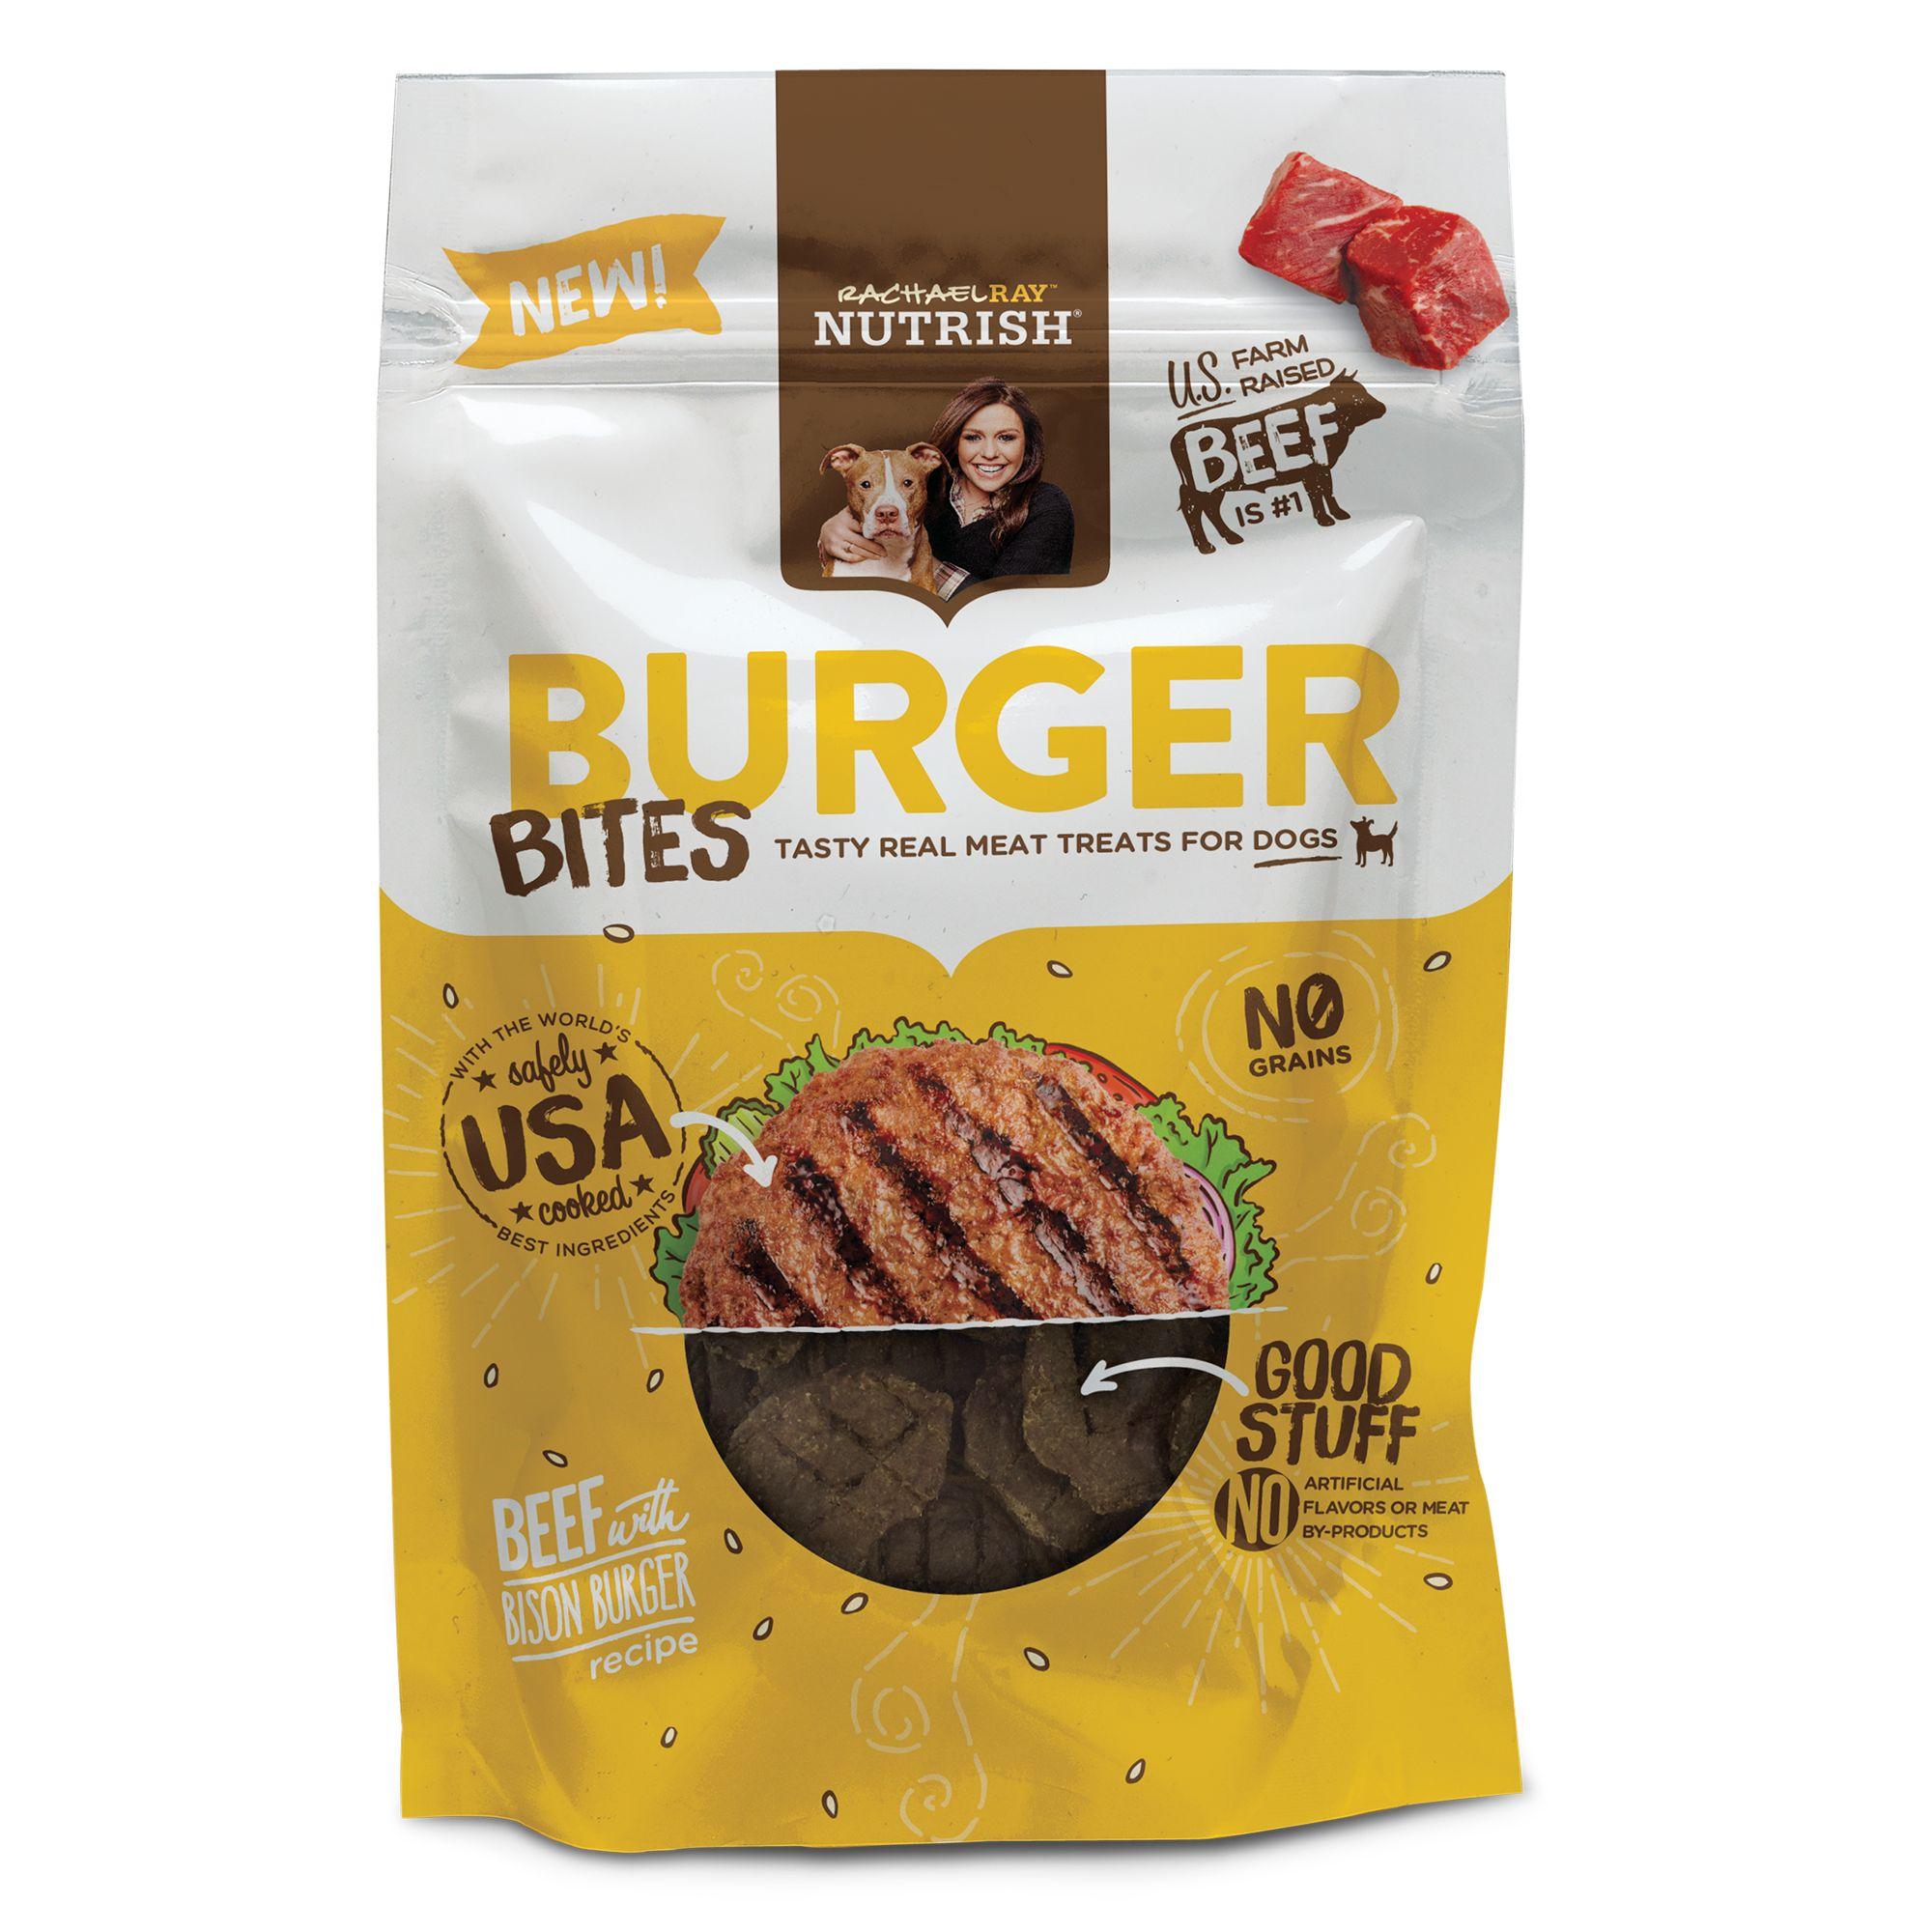 Rachael Ray, Nutrish Burger Bites Dog Treat - Grain Free, Beef with Bison Burger Recipe size: 12 Oz, Rachael Ray Nutrish 5278087